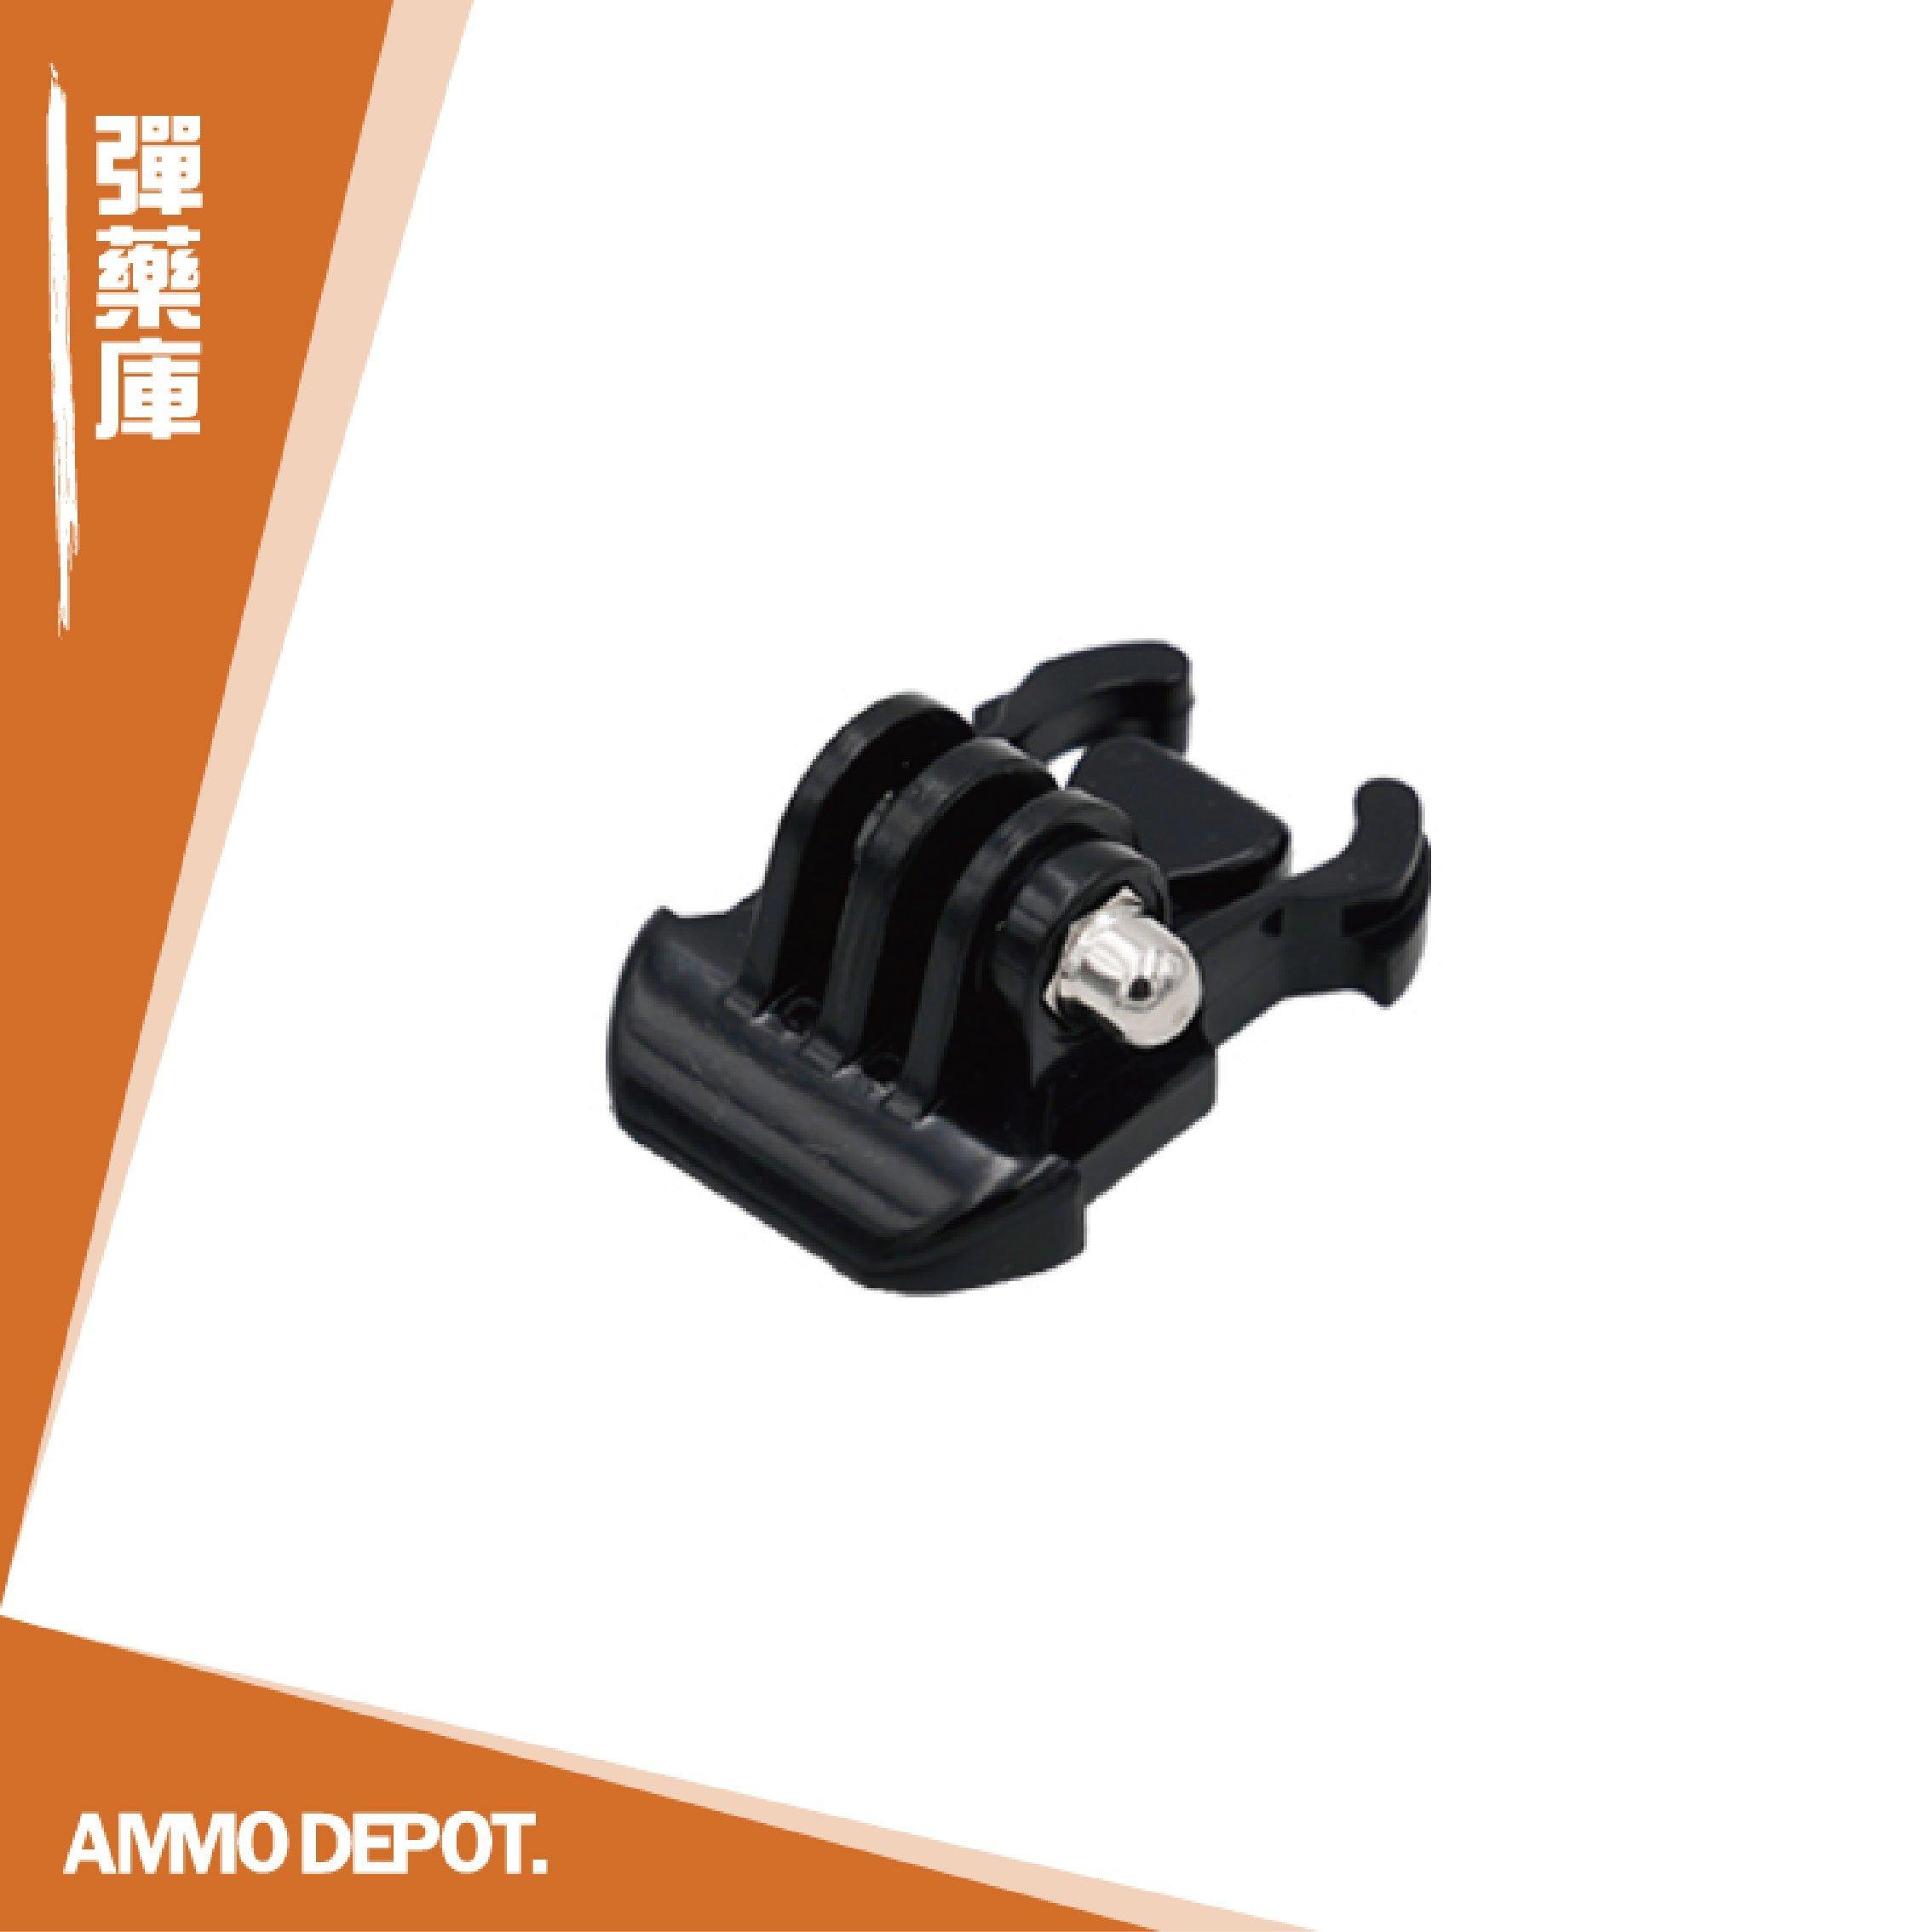 【AMMO彈藥庫】 GoPro Action SJCam Yi 運動相機 配件 標準 快拆扣 快扣 DF-Q01